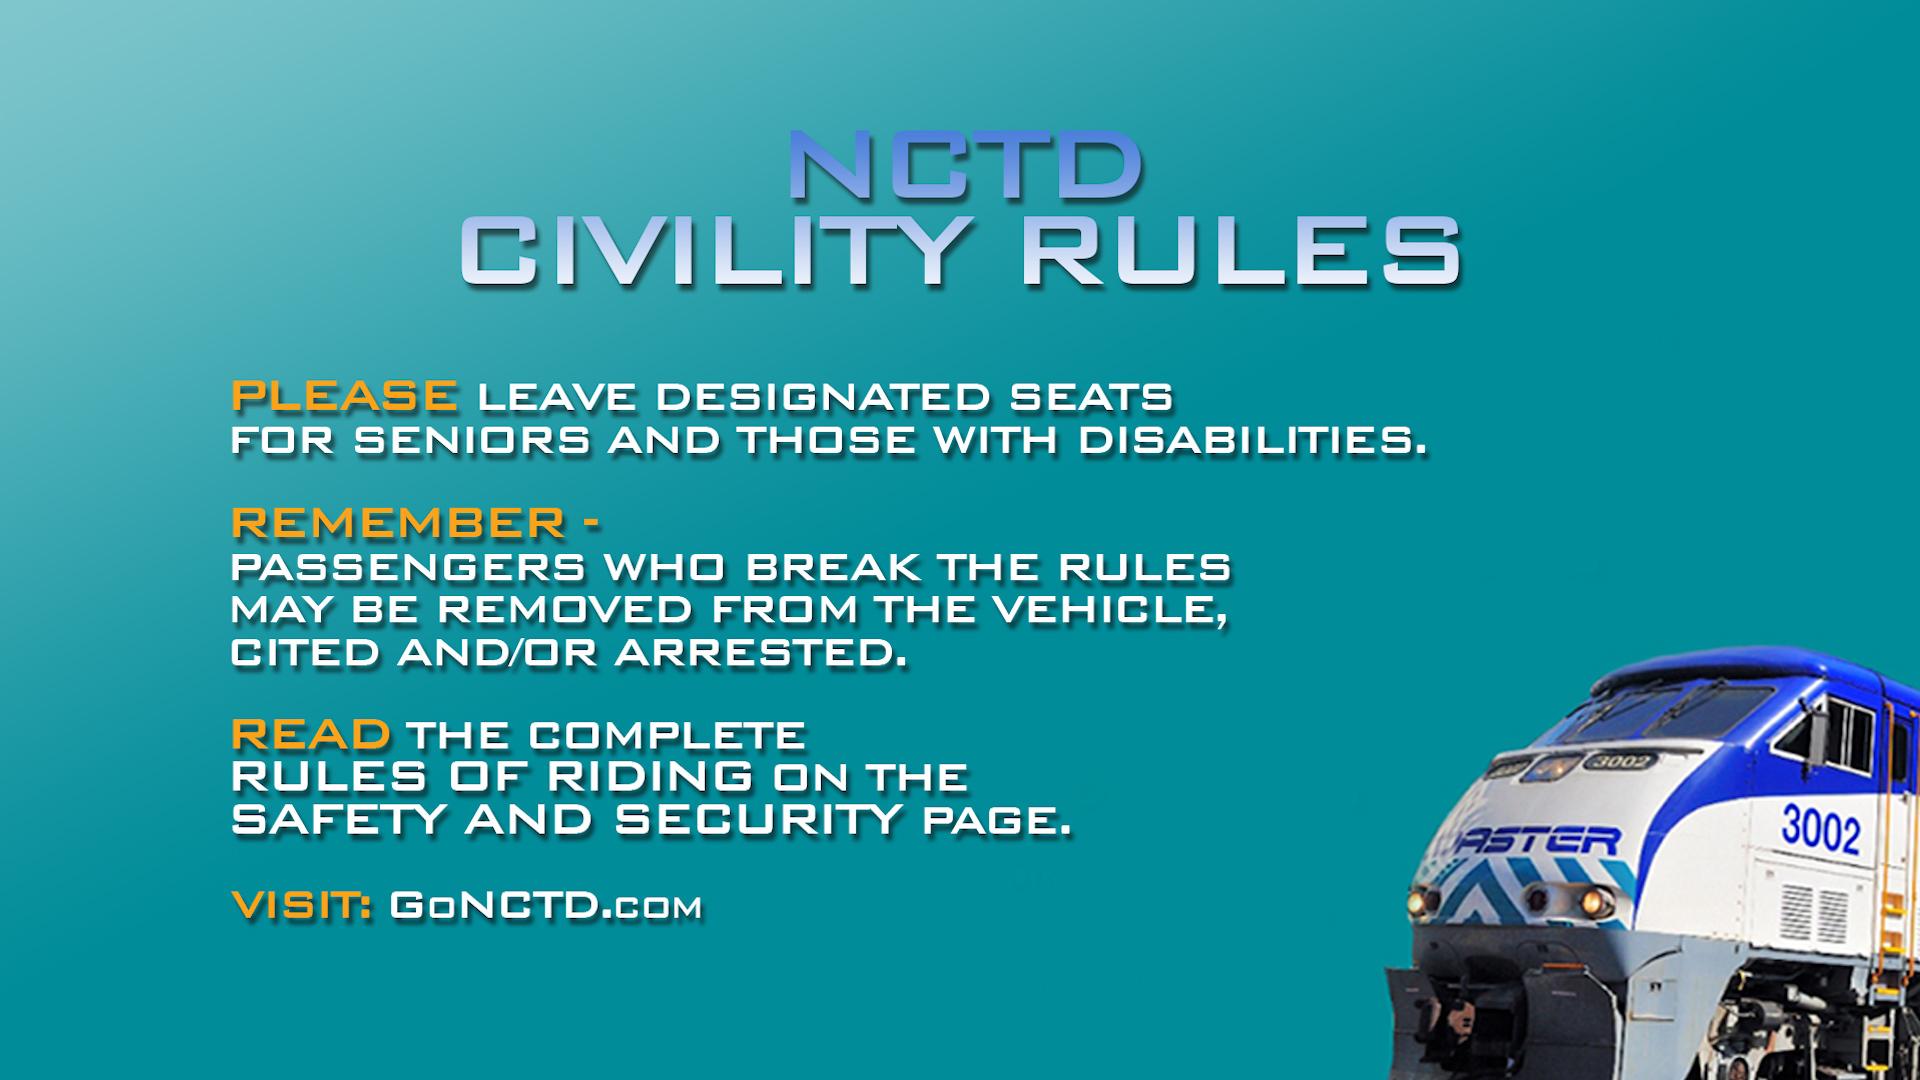 ComCal_NCTD_civilityRules.jpg